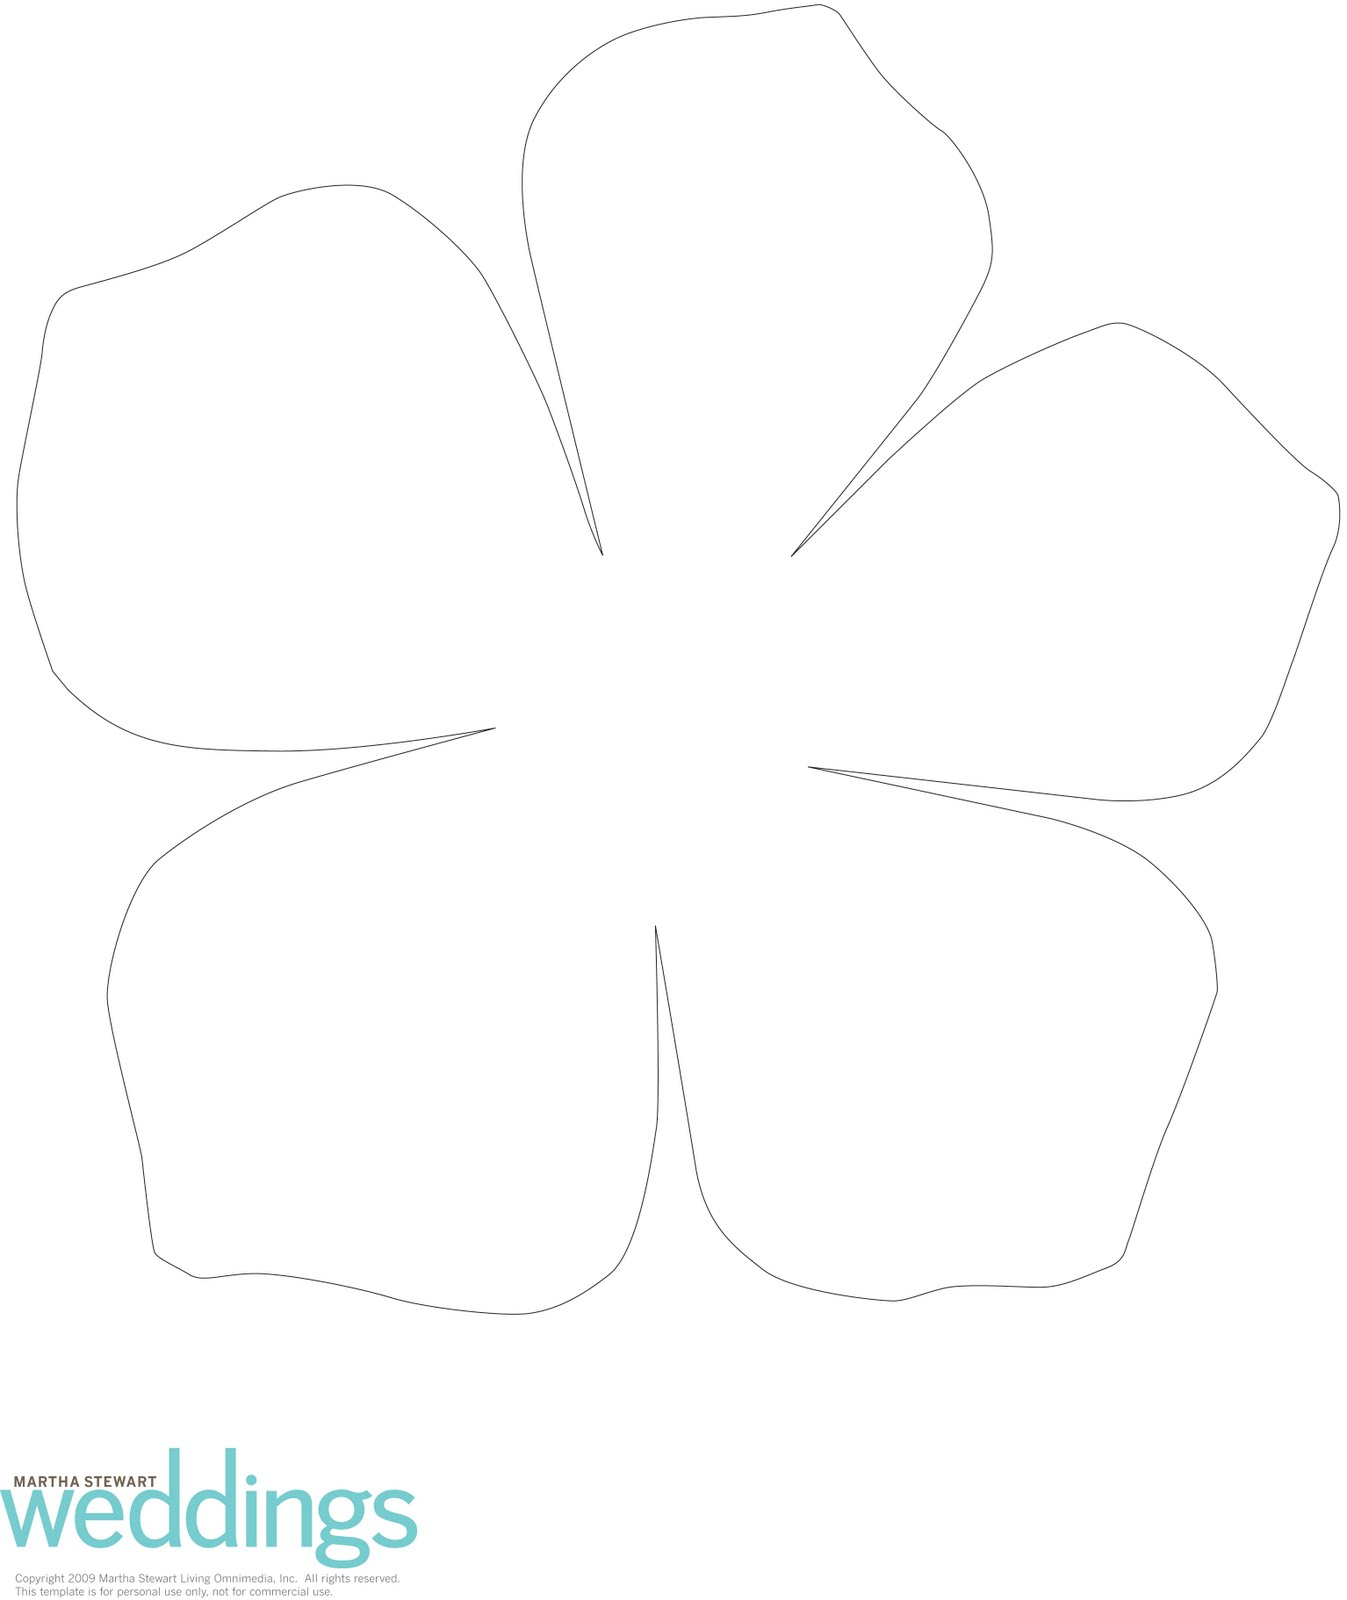 Five Petal Flower Clip Art Clipart Collection - 5 Petal Flower Template Free Printable